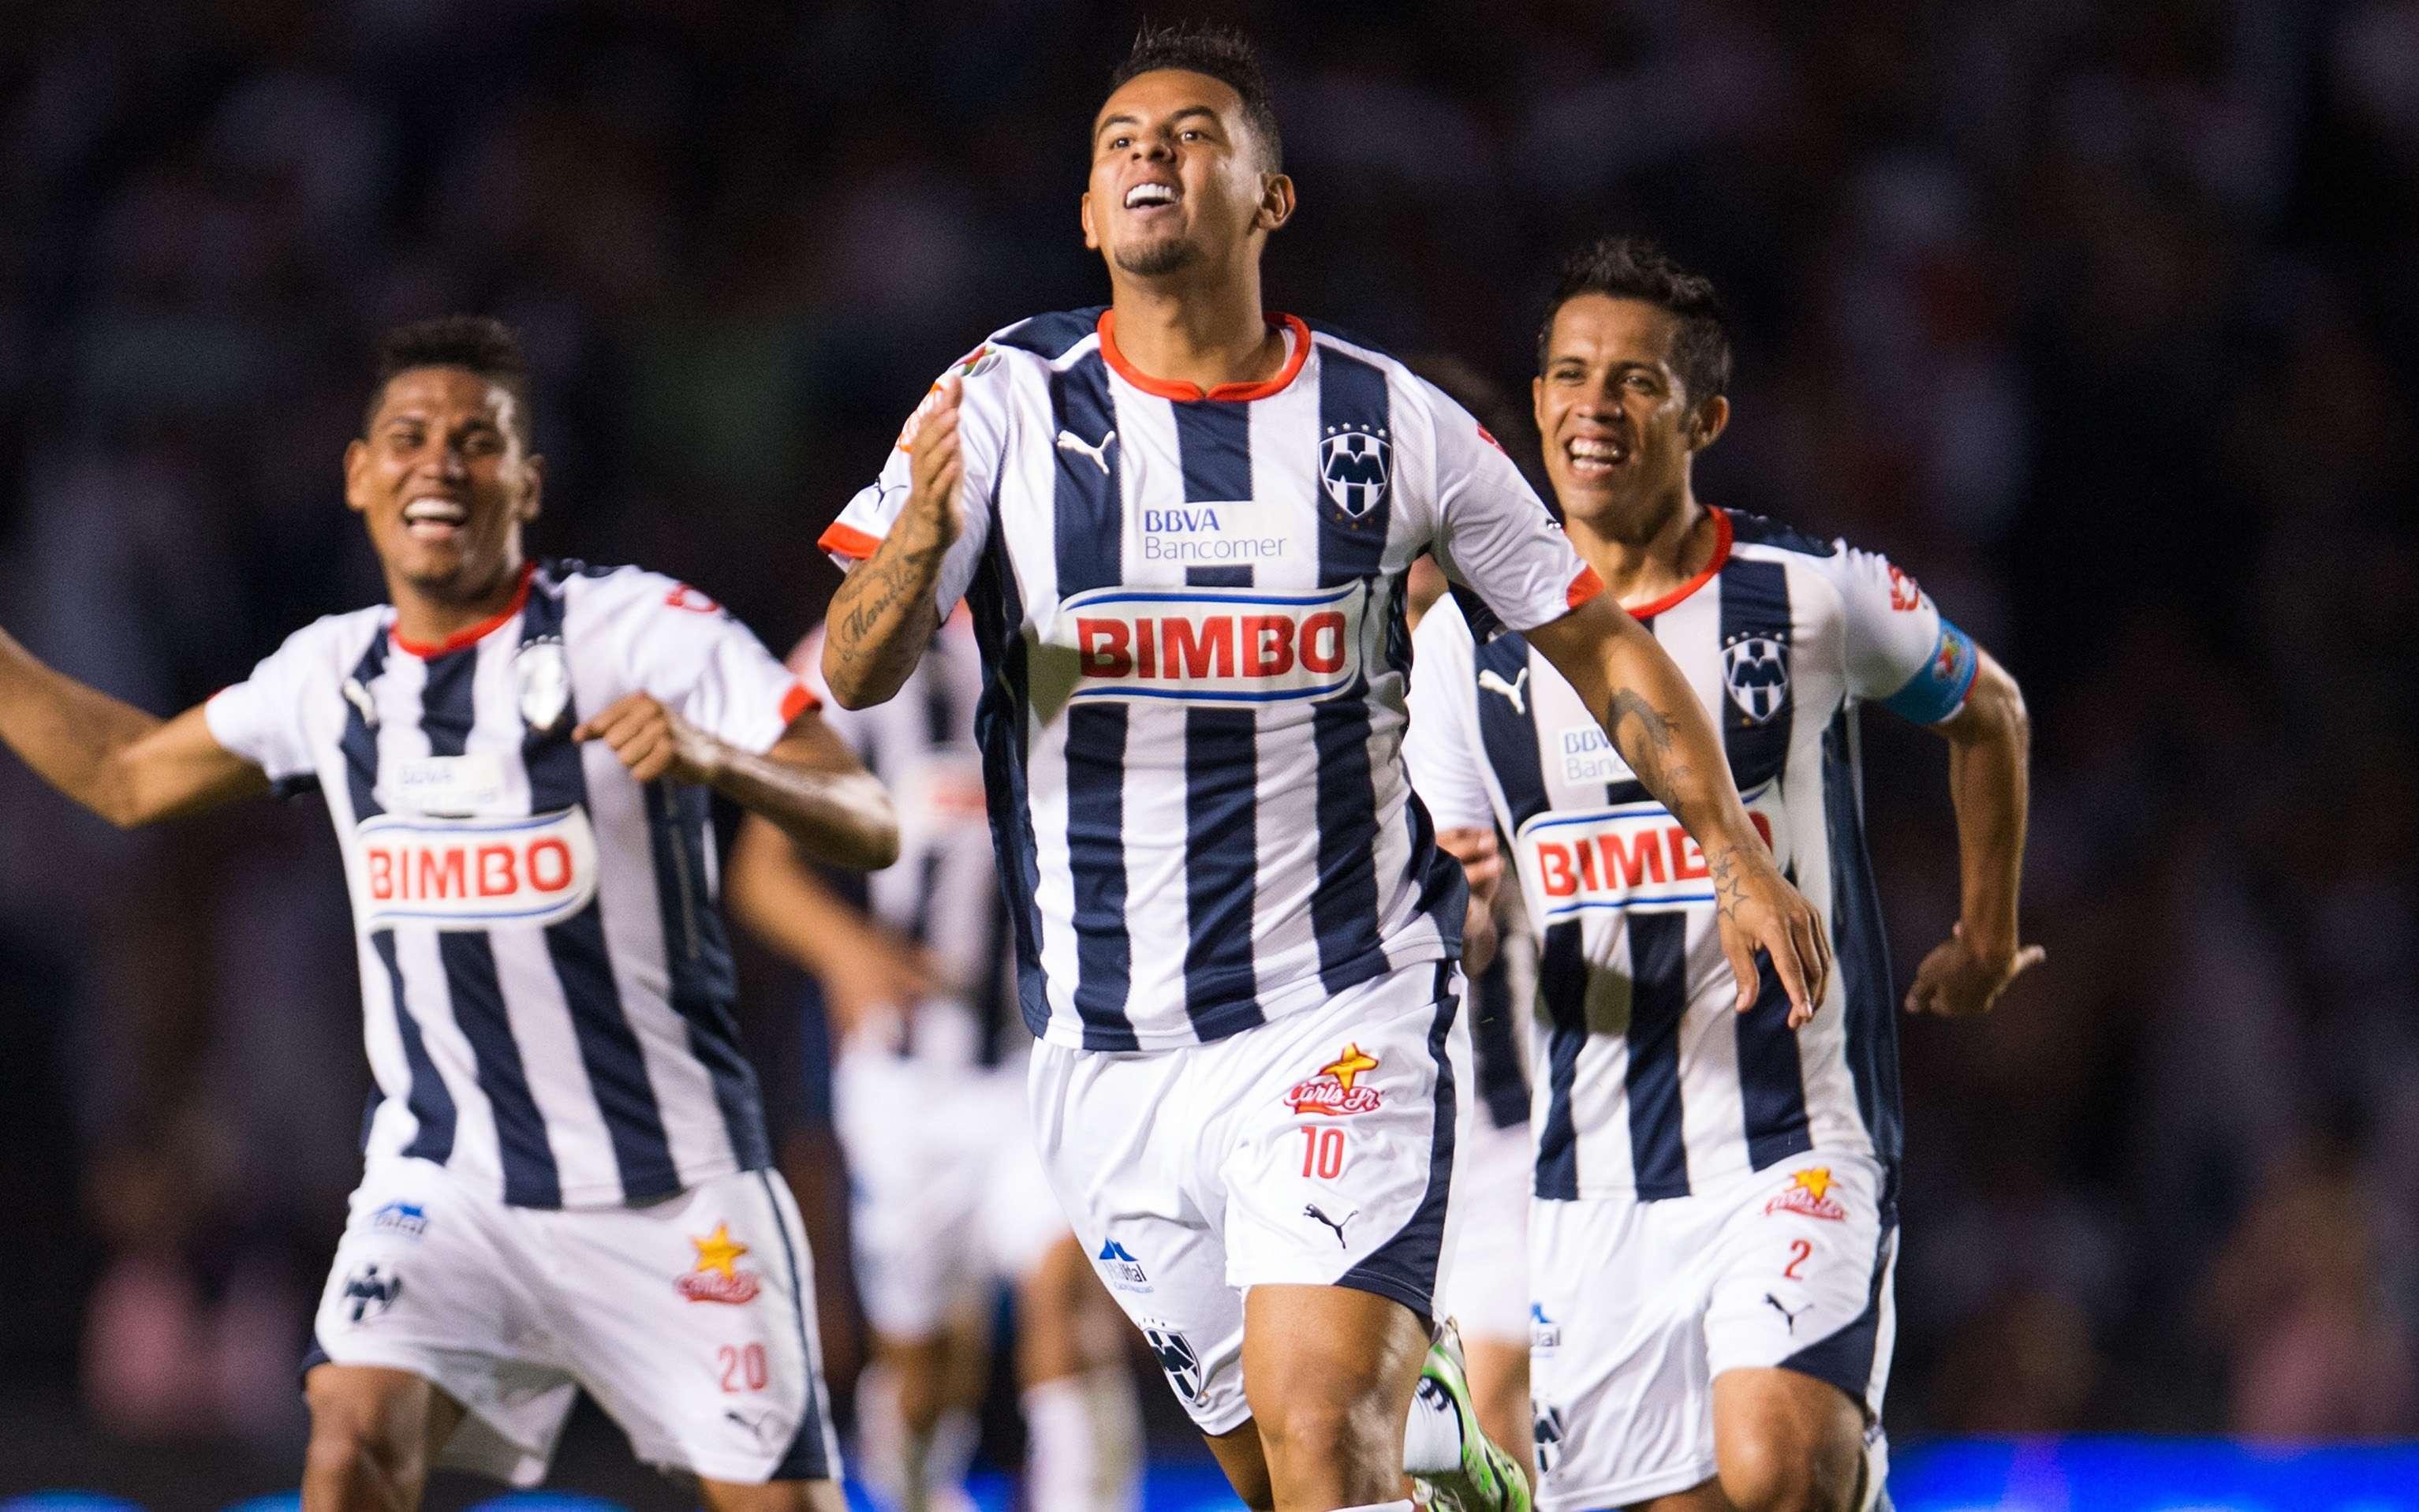 Edwin Cardona marcó el mejor gol de la jornada 7, en el triunfo de Rayados sobre Querétaro. Foto: Mexsport